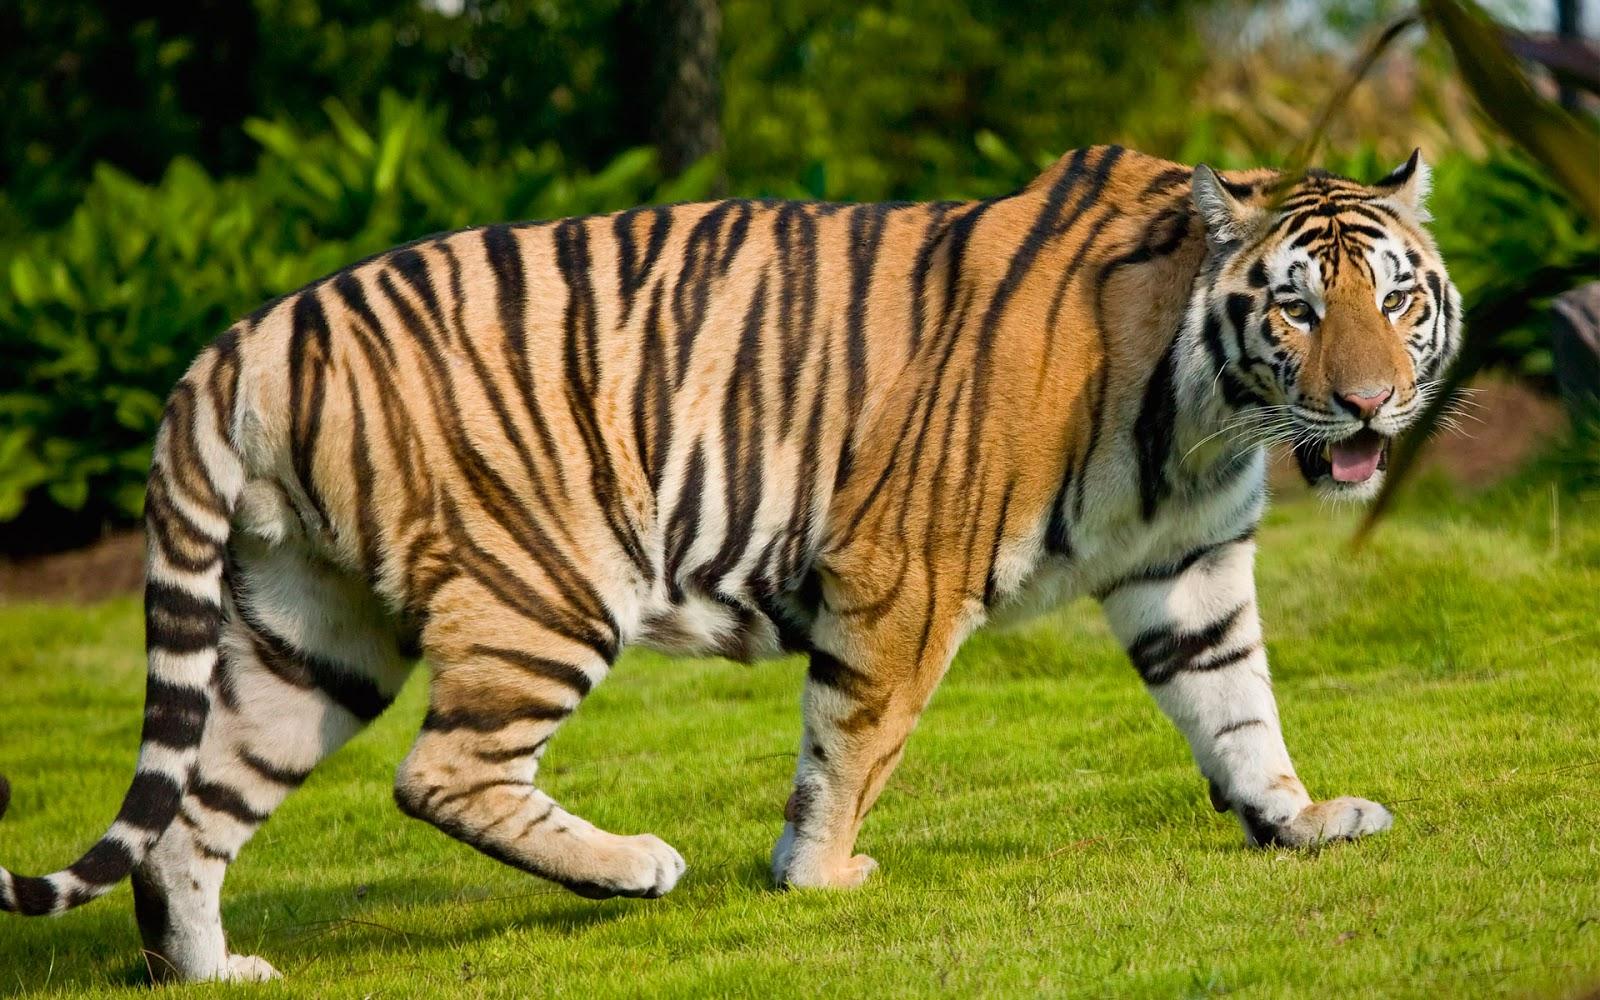 tiger full hd wallpaper mobile and desktop backgrounds free download